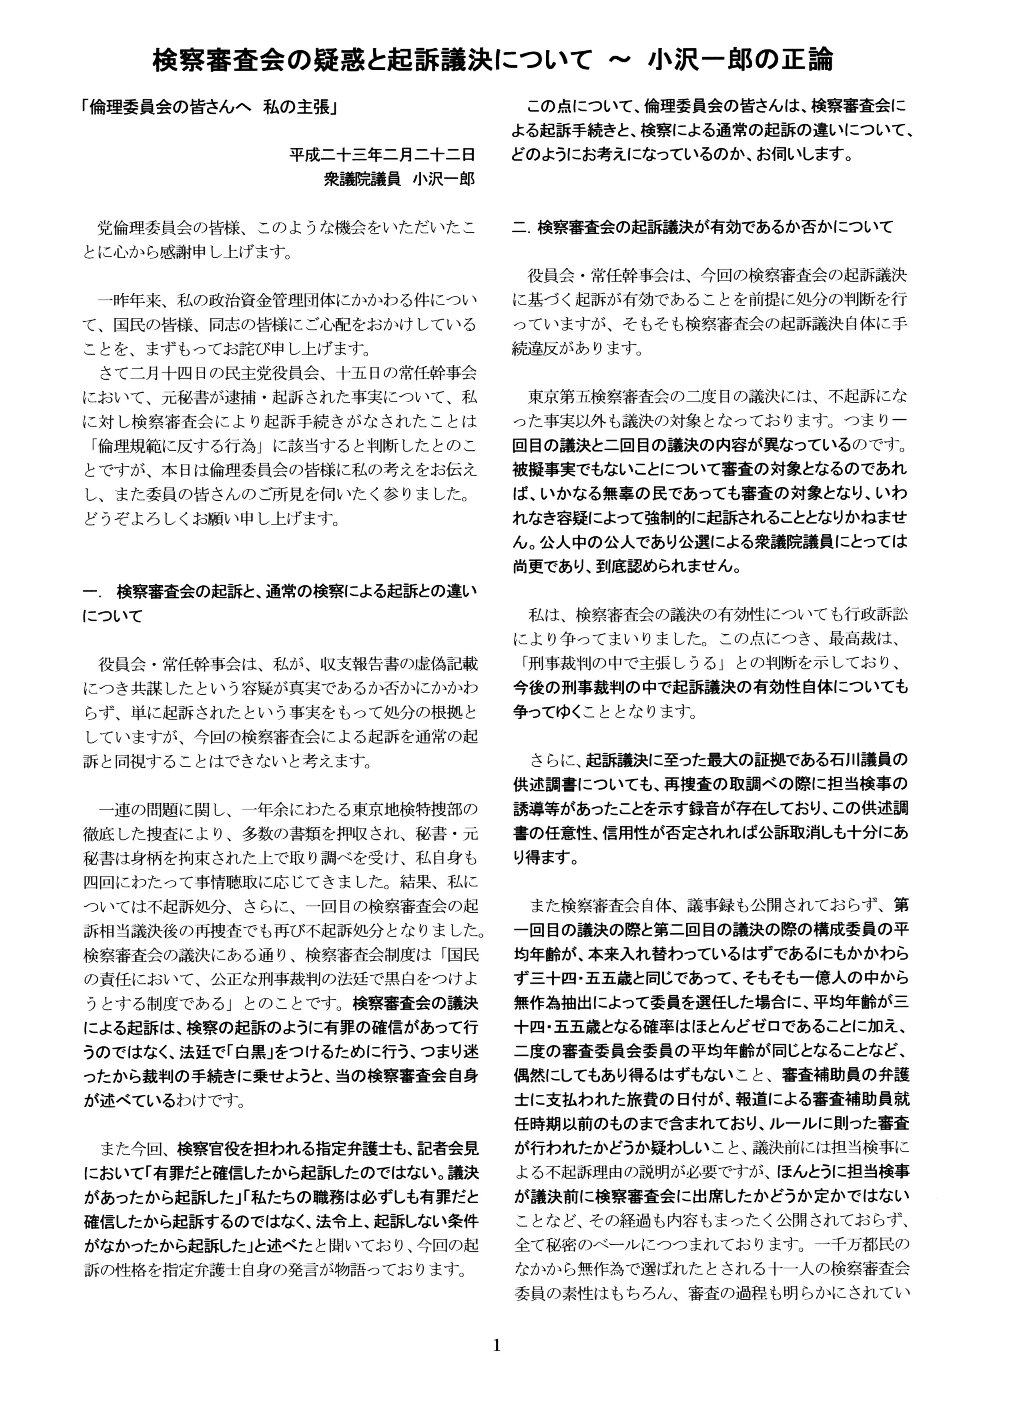 pdf 印刷 1ページ 2枚